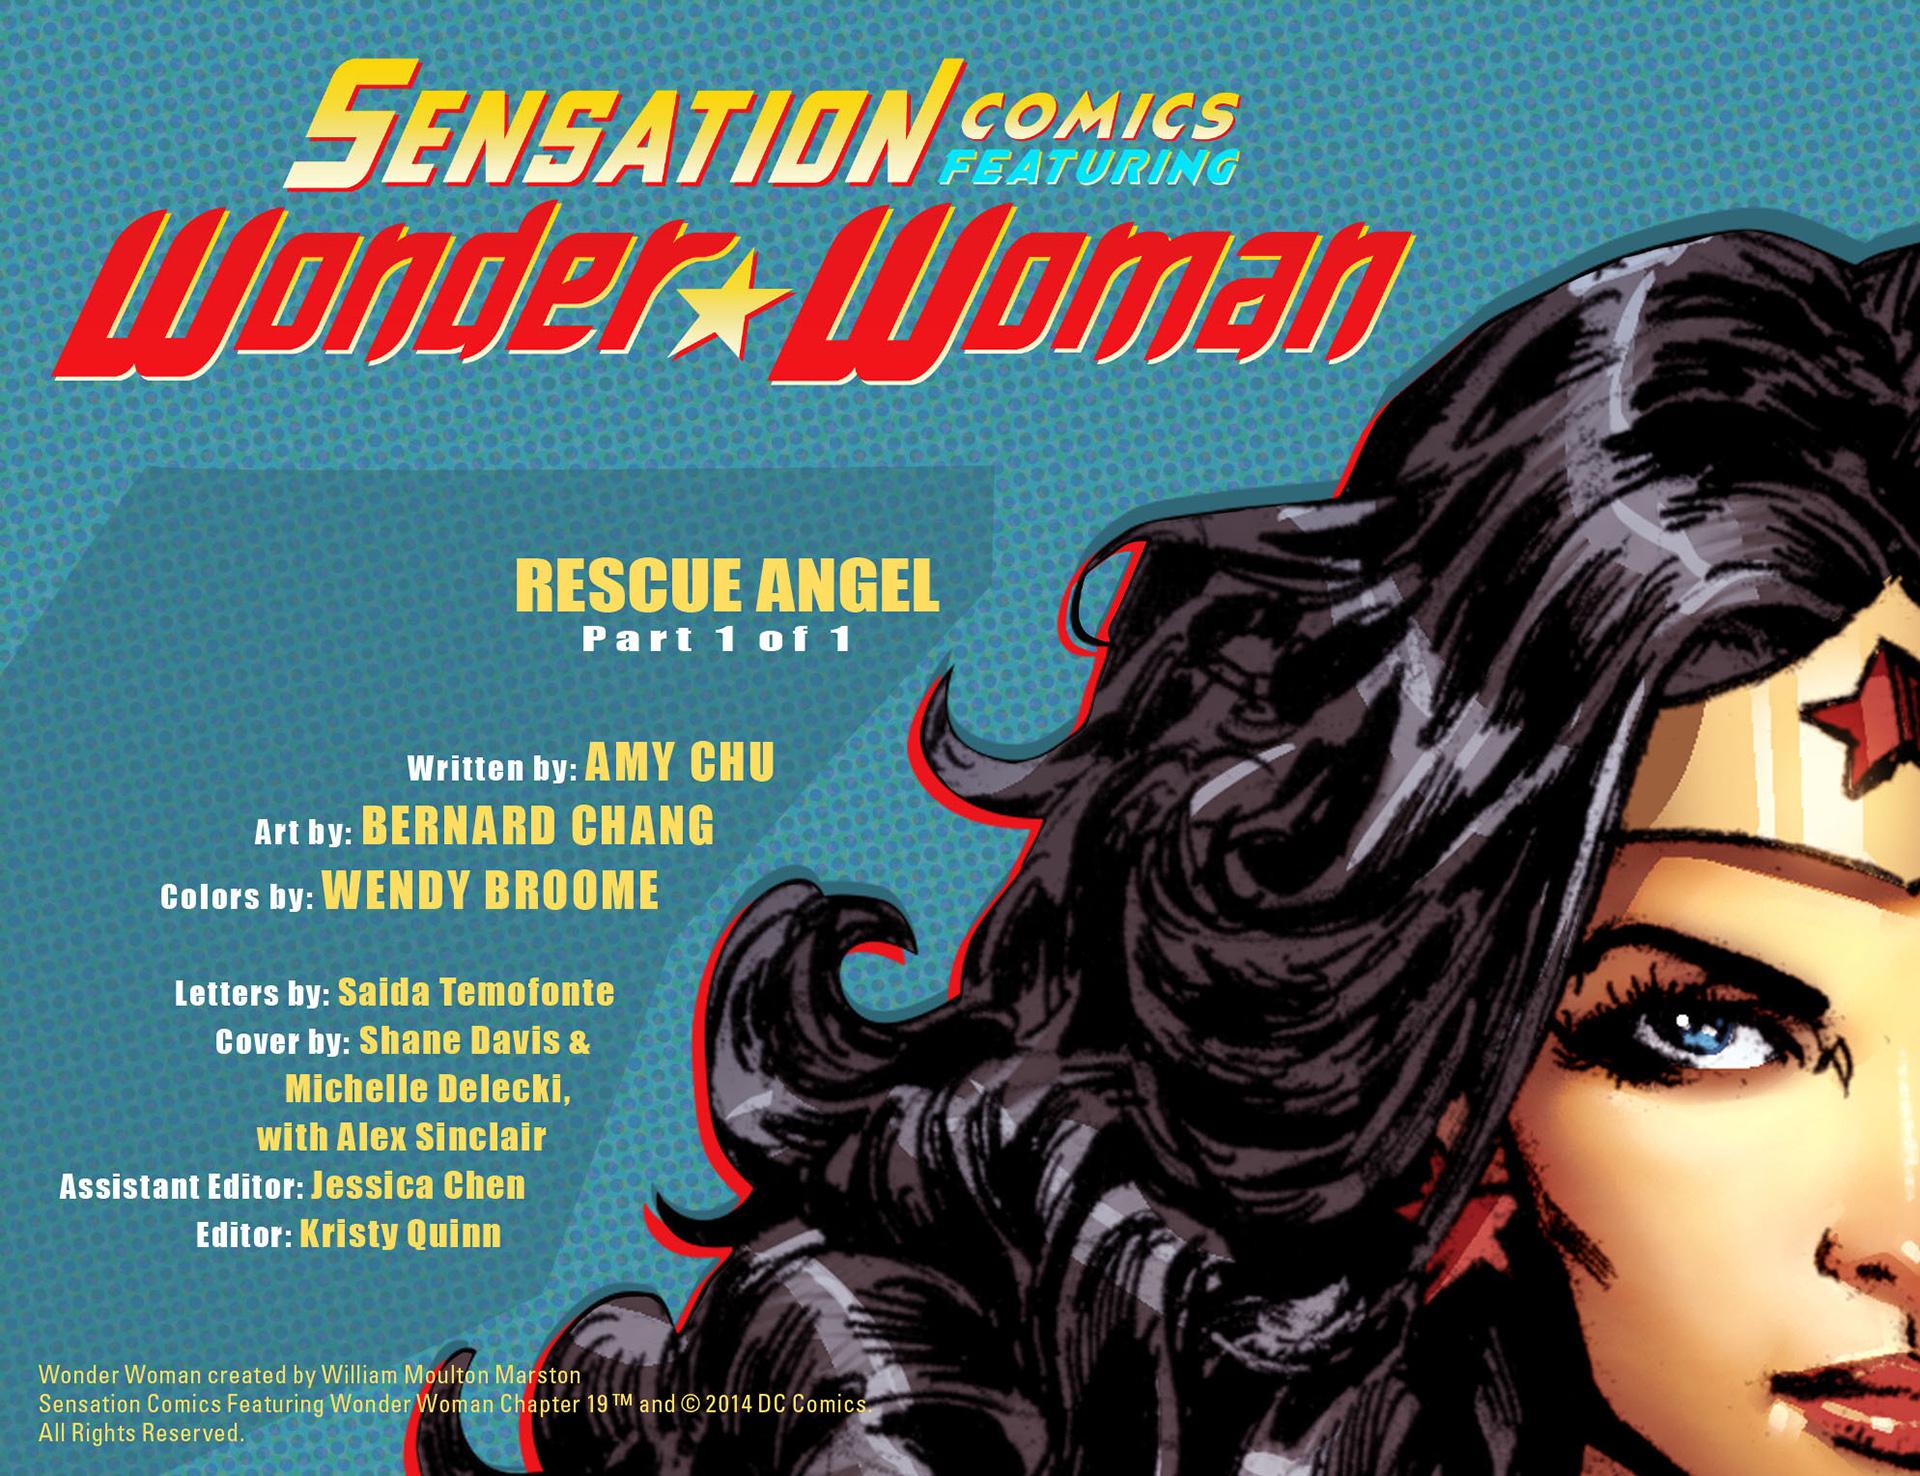 Read online Sensation Comics Featuring Wonder Woman comic -  Issue #19 - 2